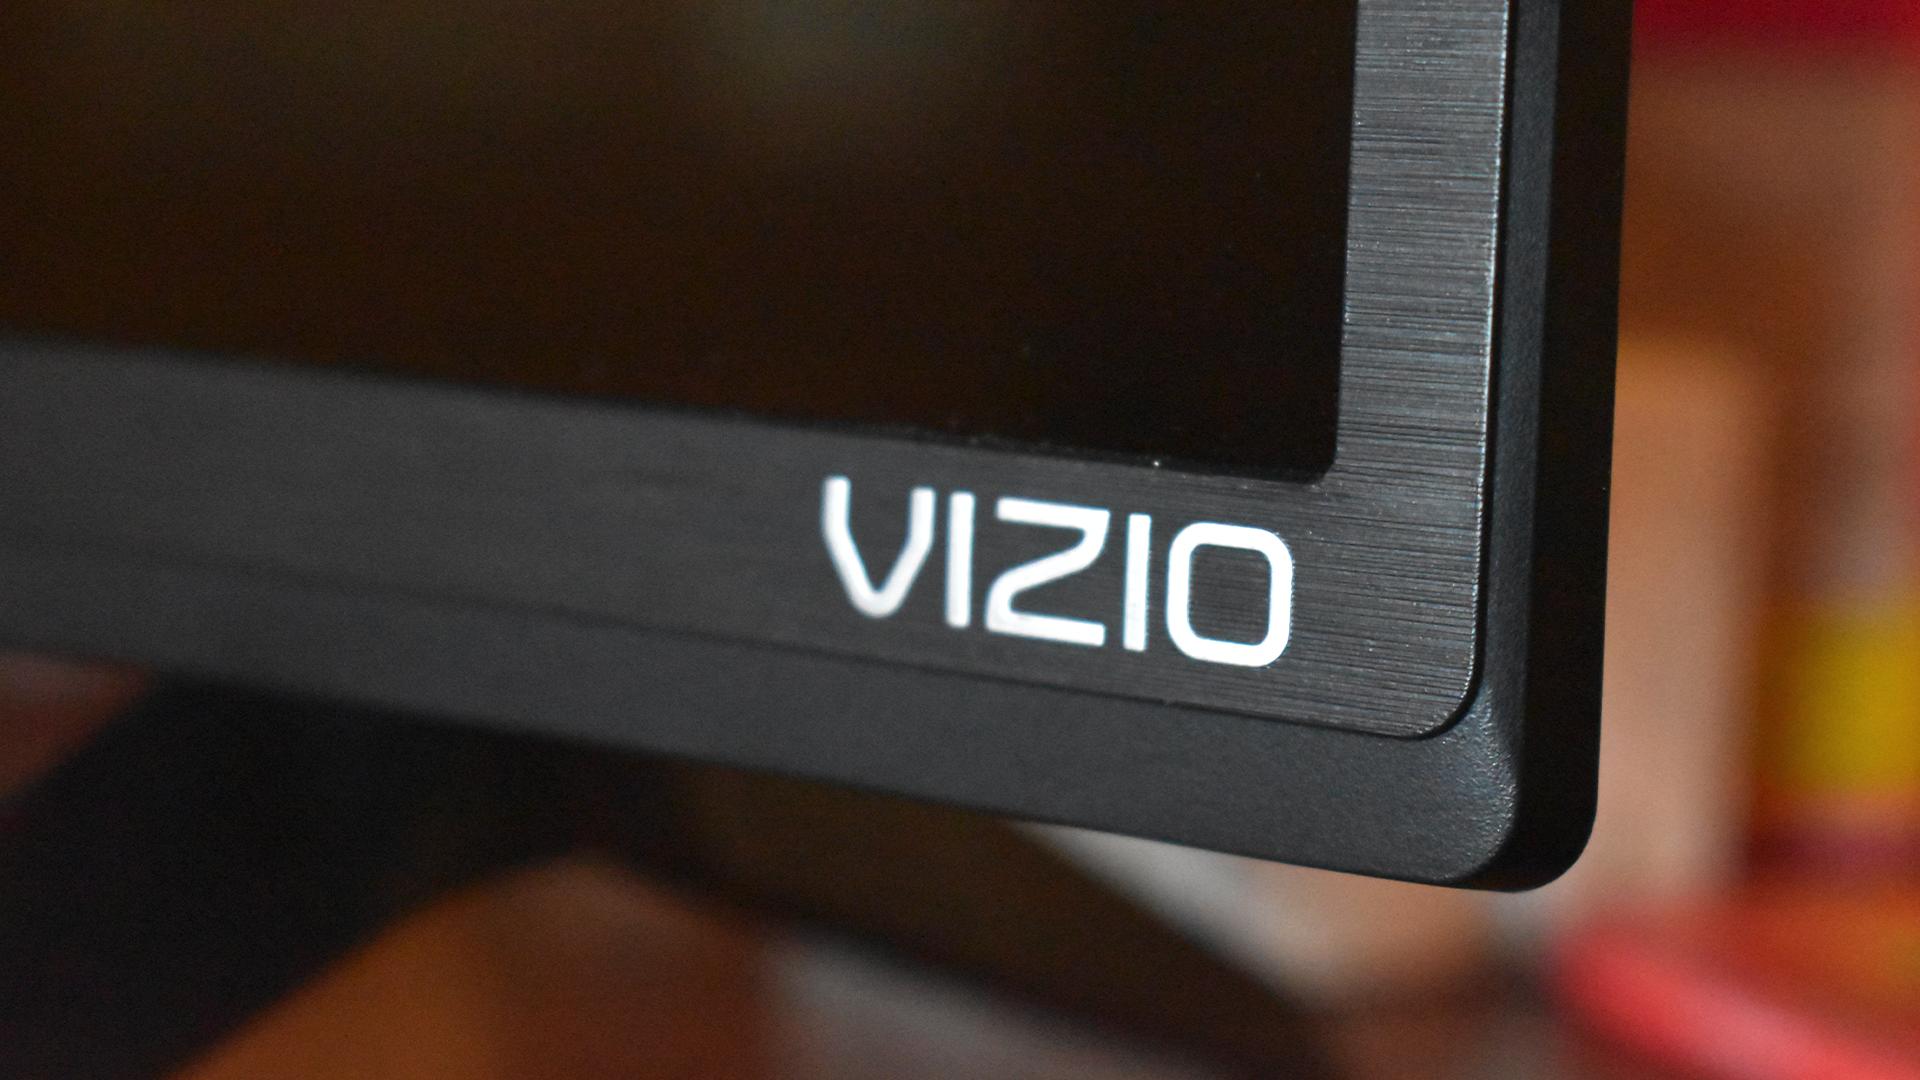 The Vizio TV's logo.